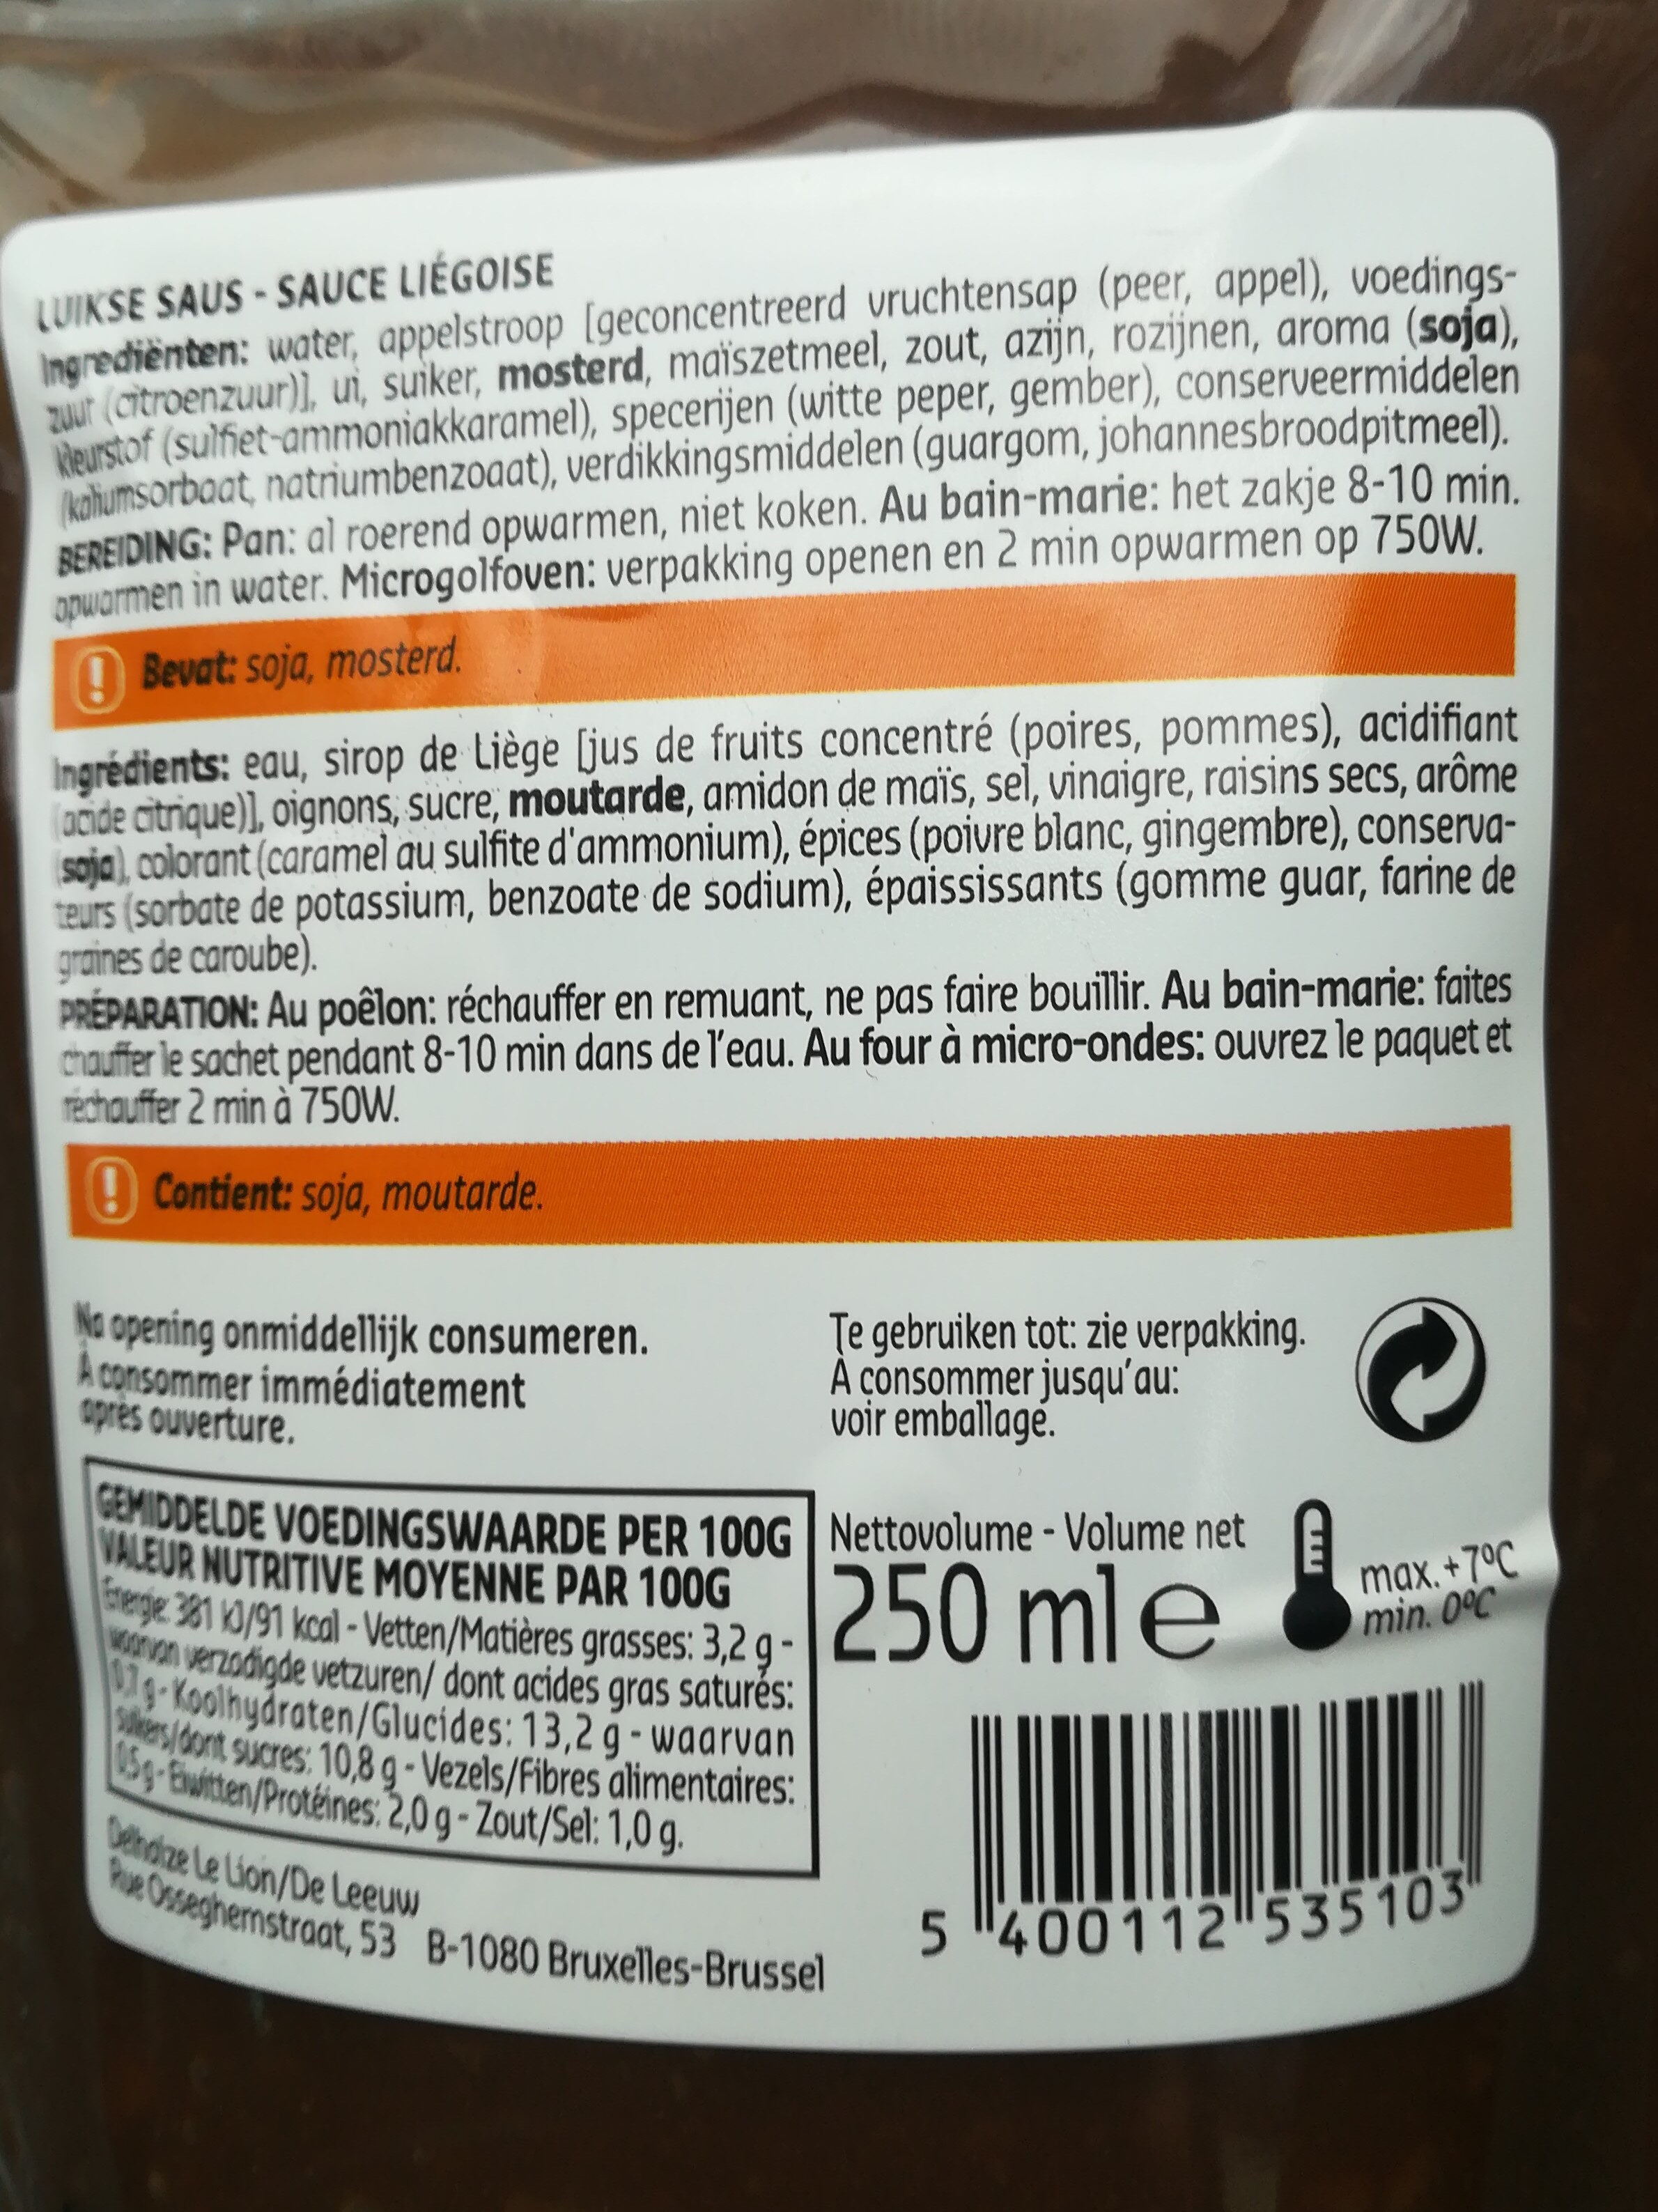 culinary liégeoise sauce - Ingrediënten